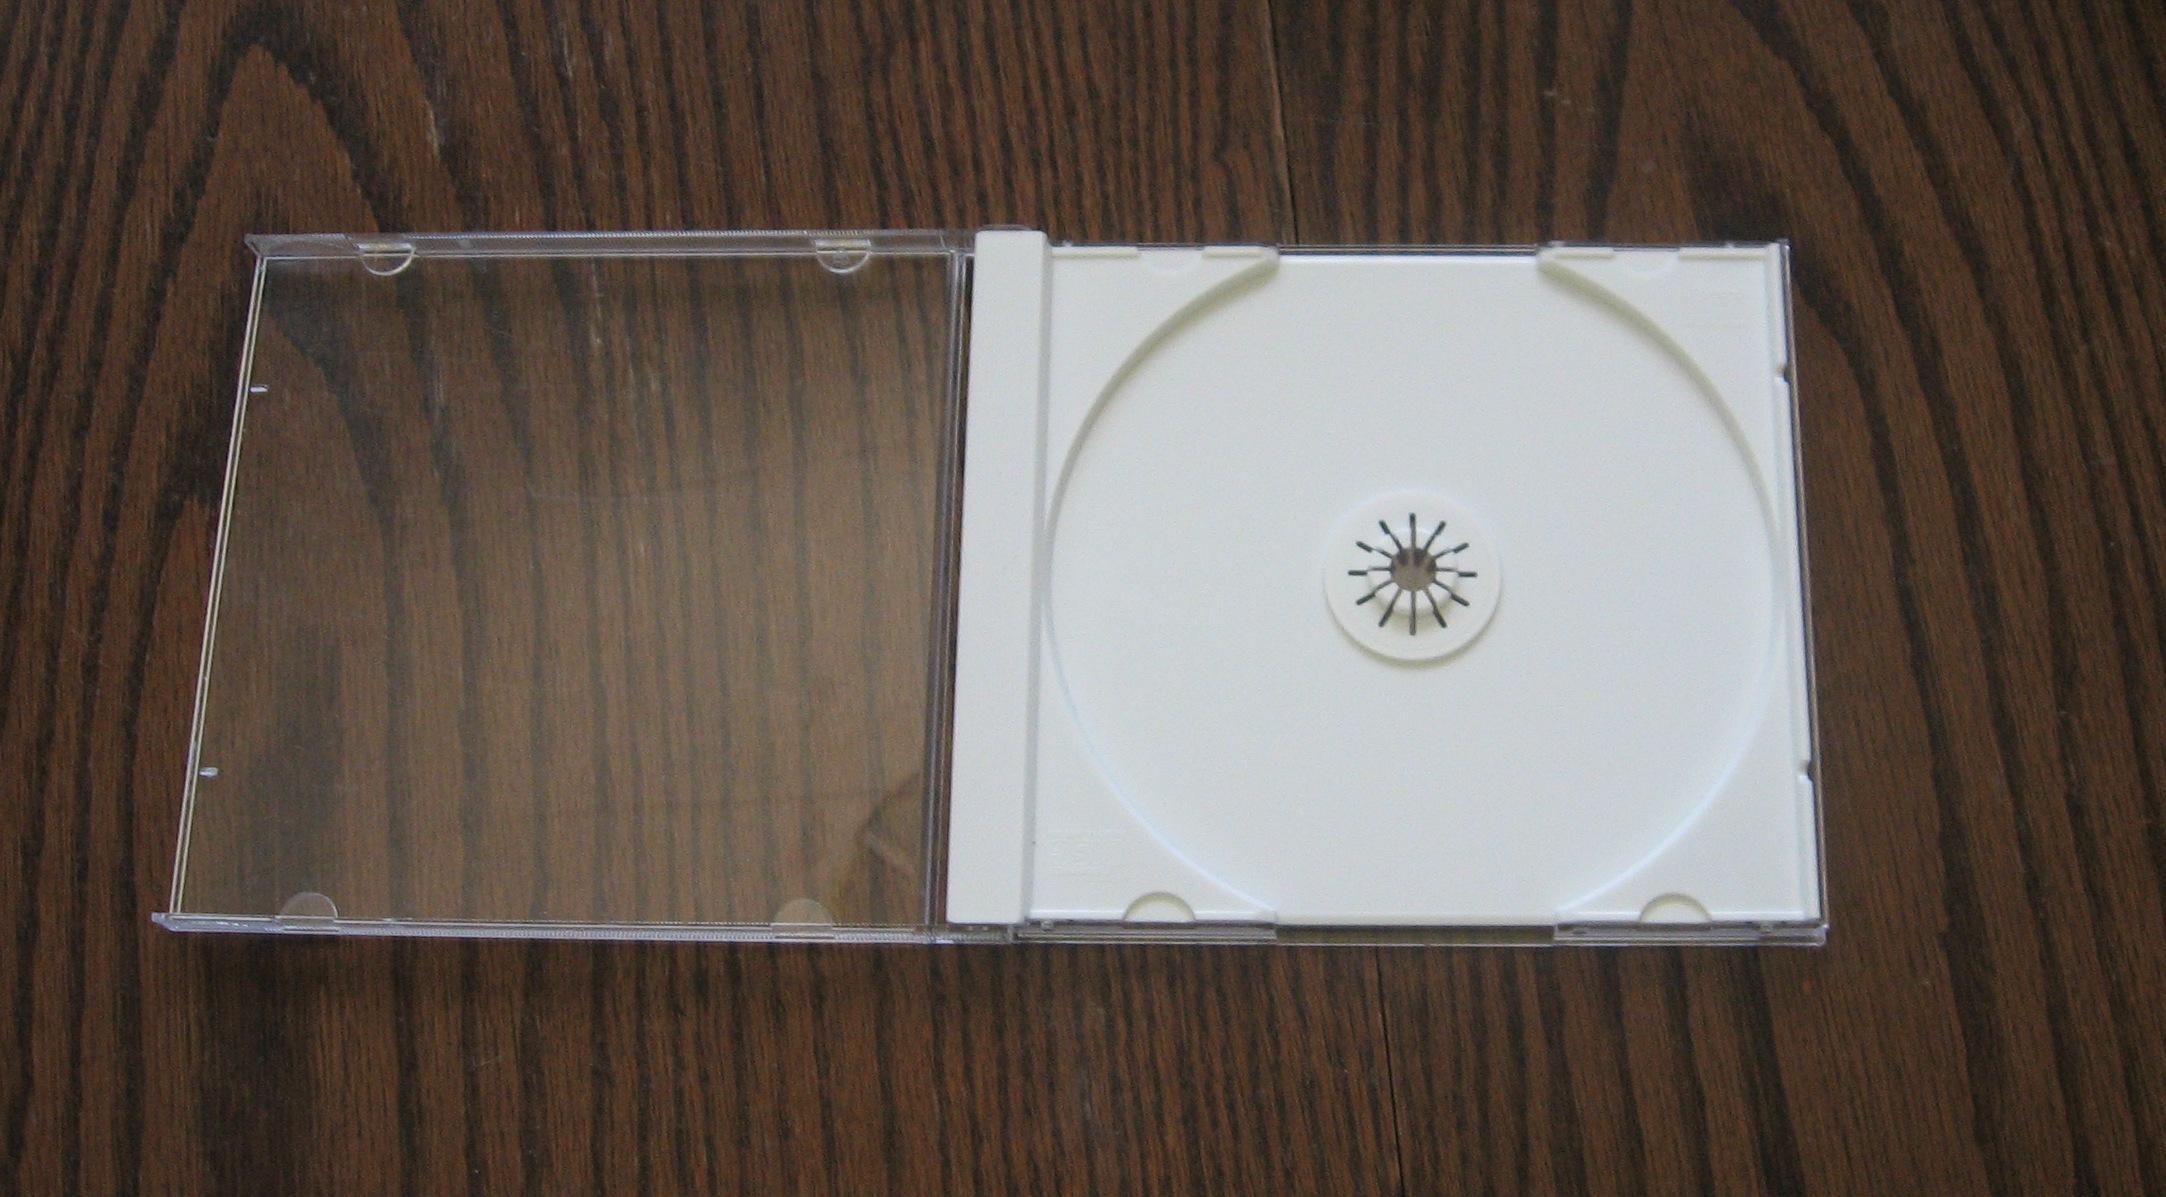 File:Cd jewel case, no art, right angle.jpg - Wikimedia Commons